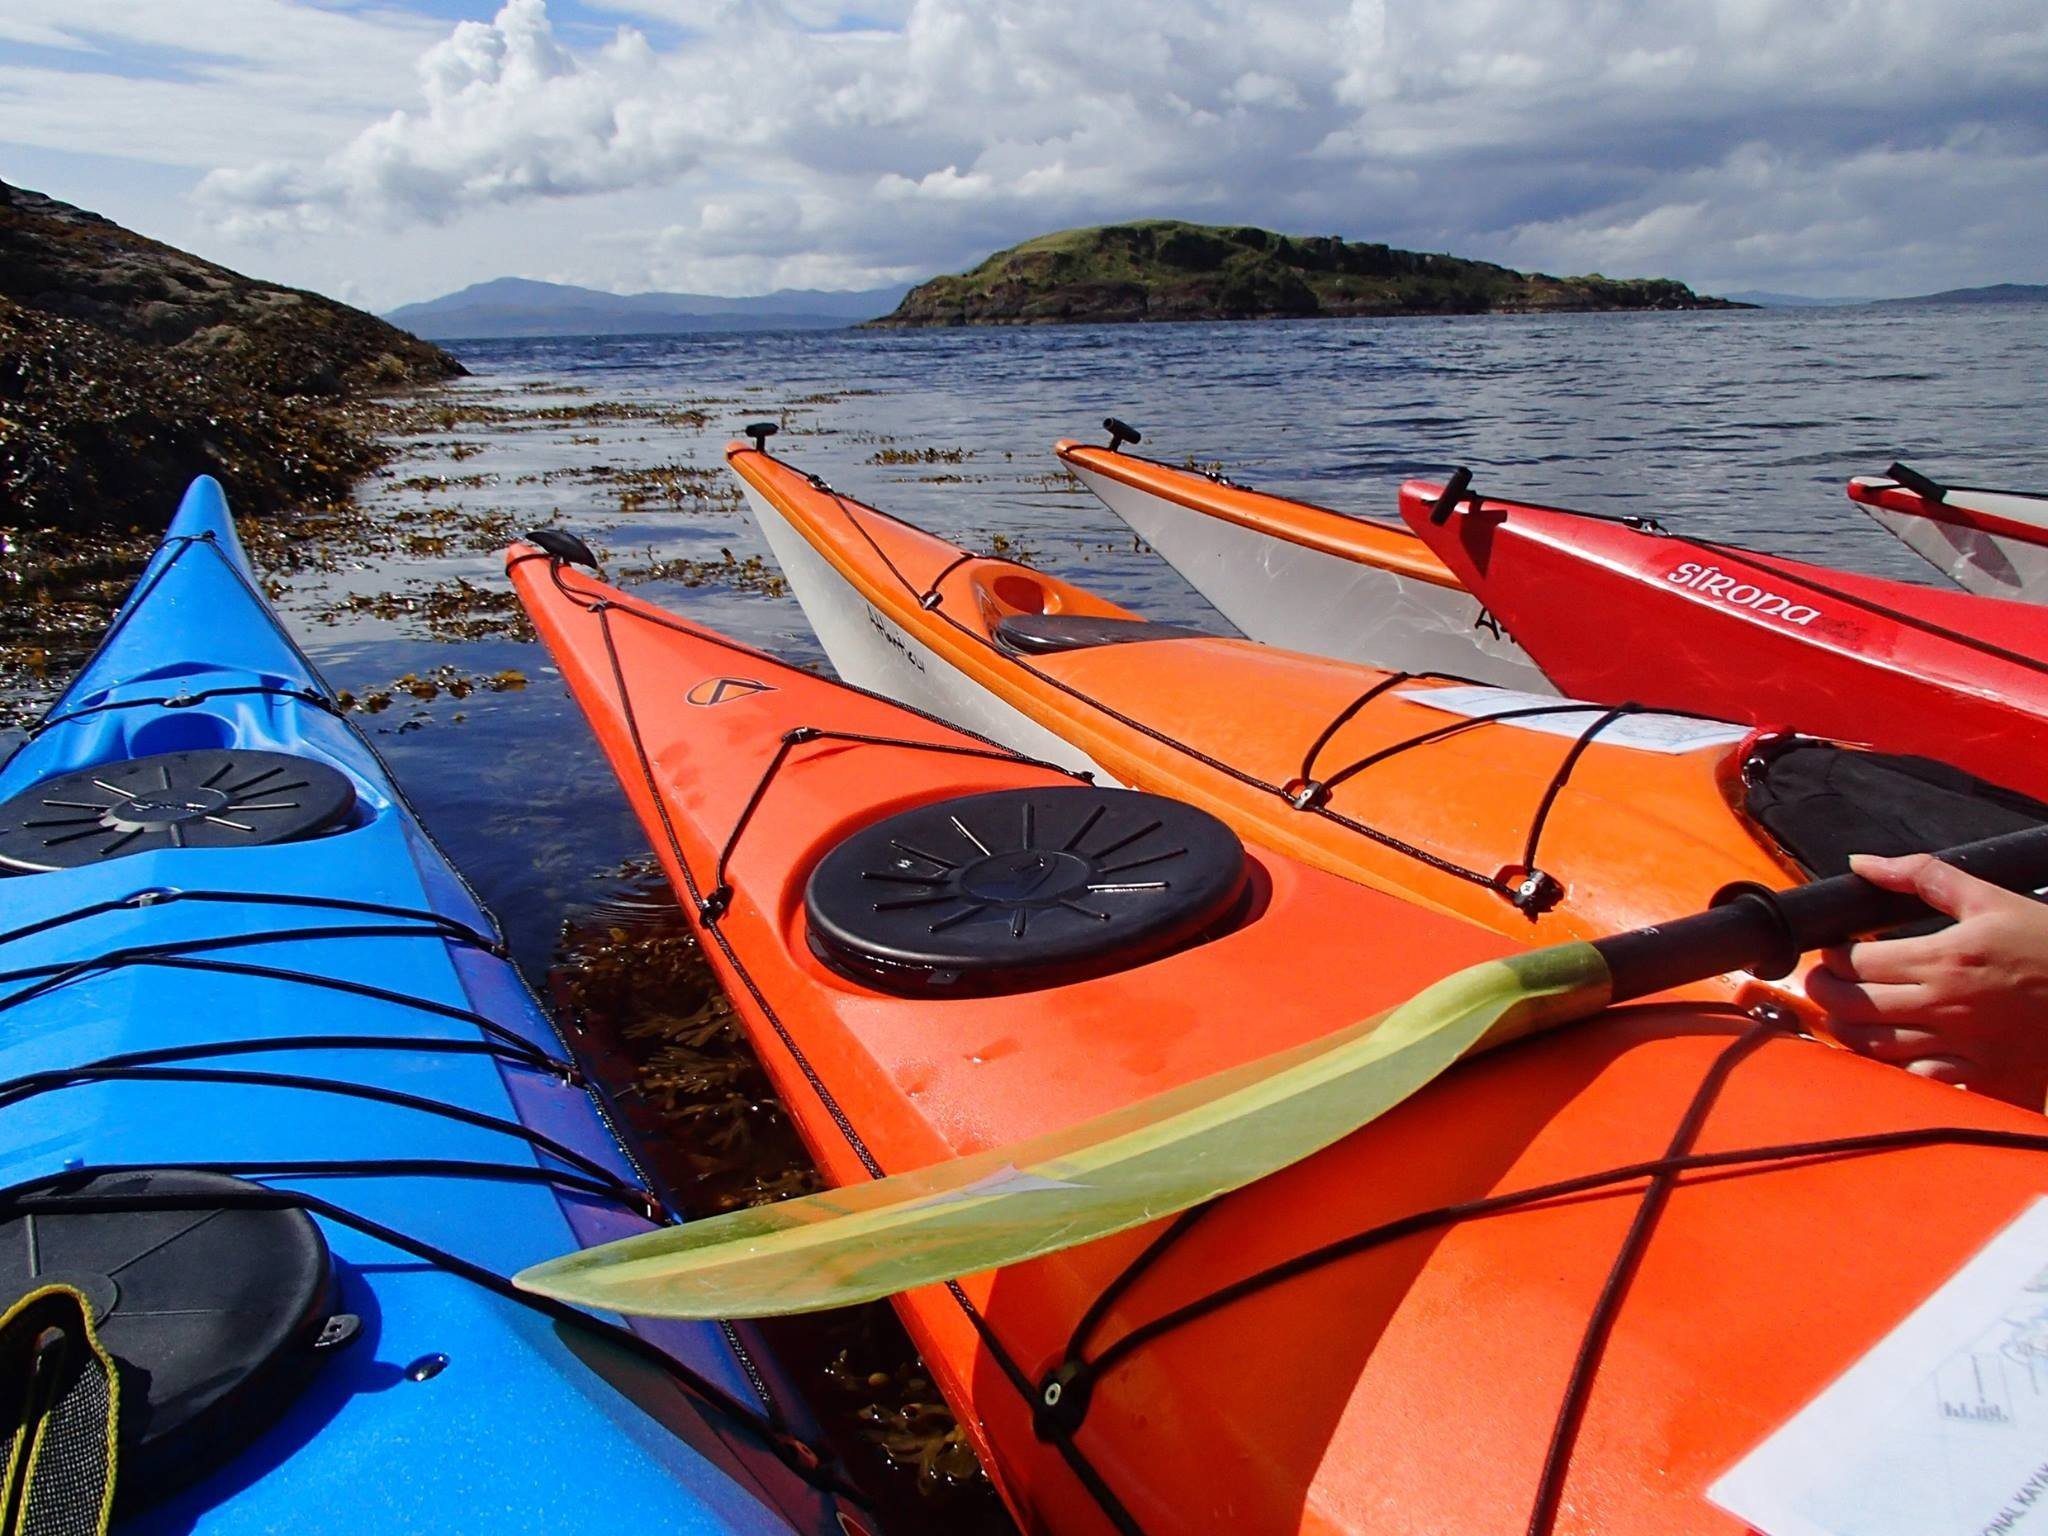 HUGE Stock Of Valley PH Venture Northshore Sea Kayaks And Epic Surf Skis